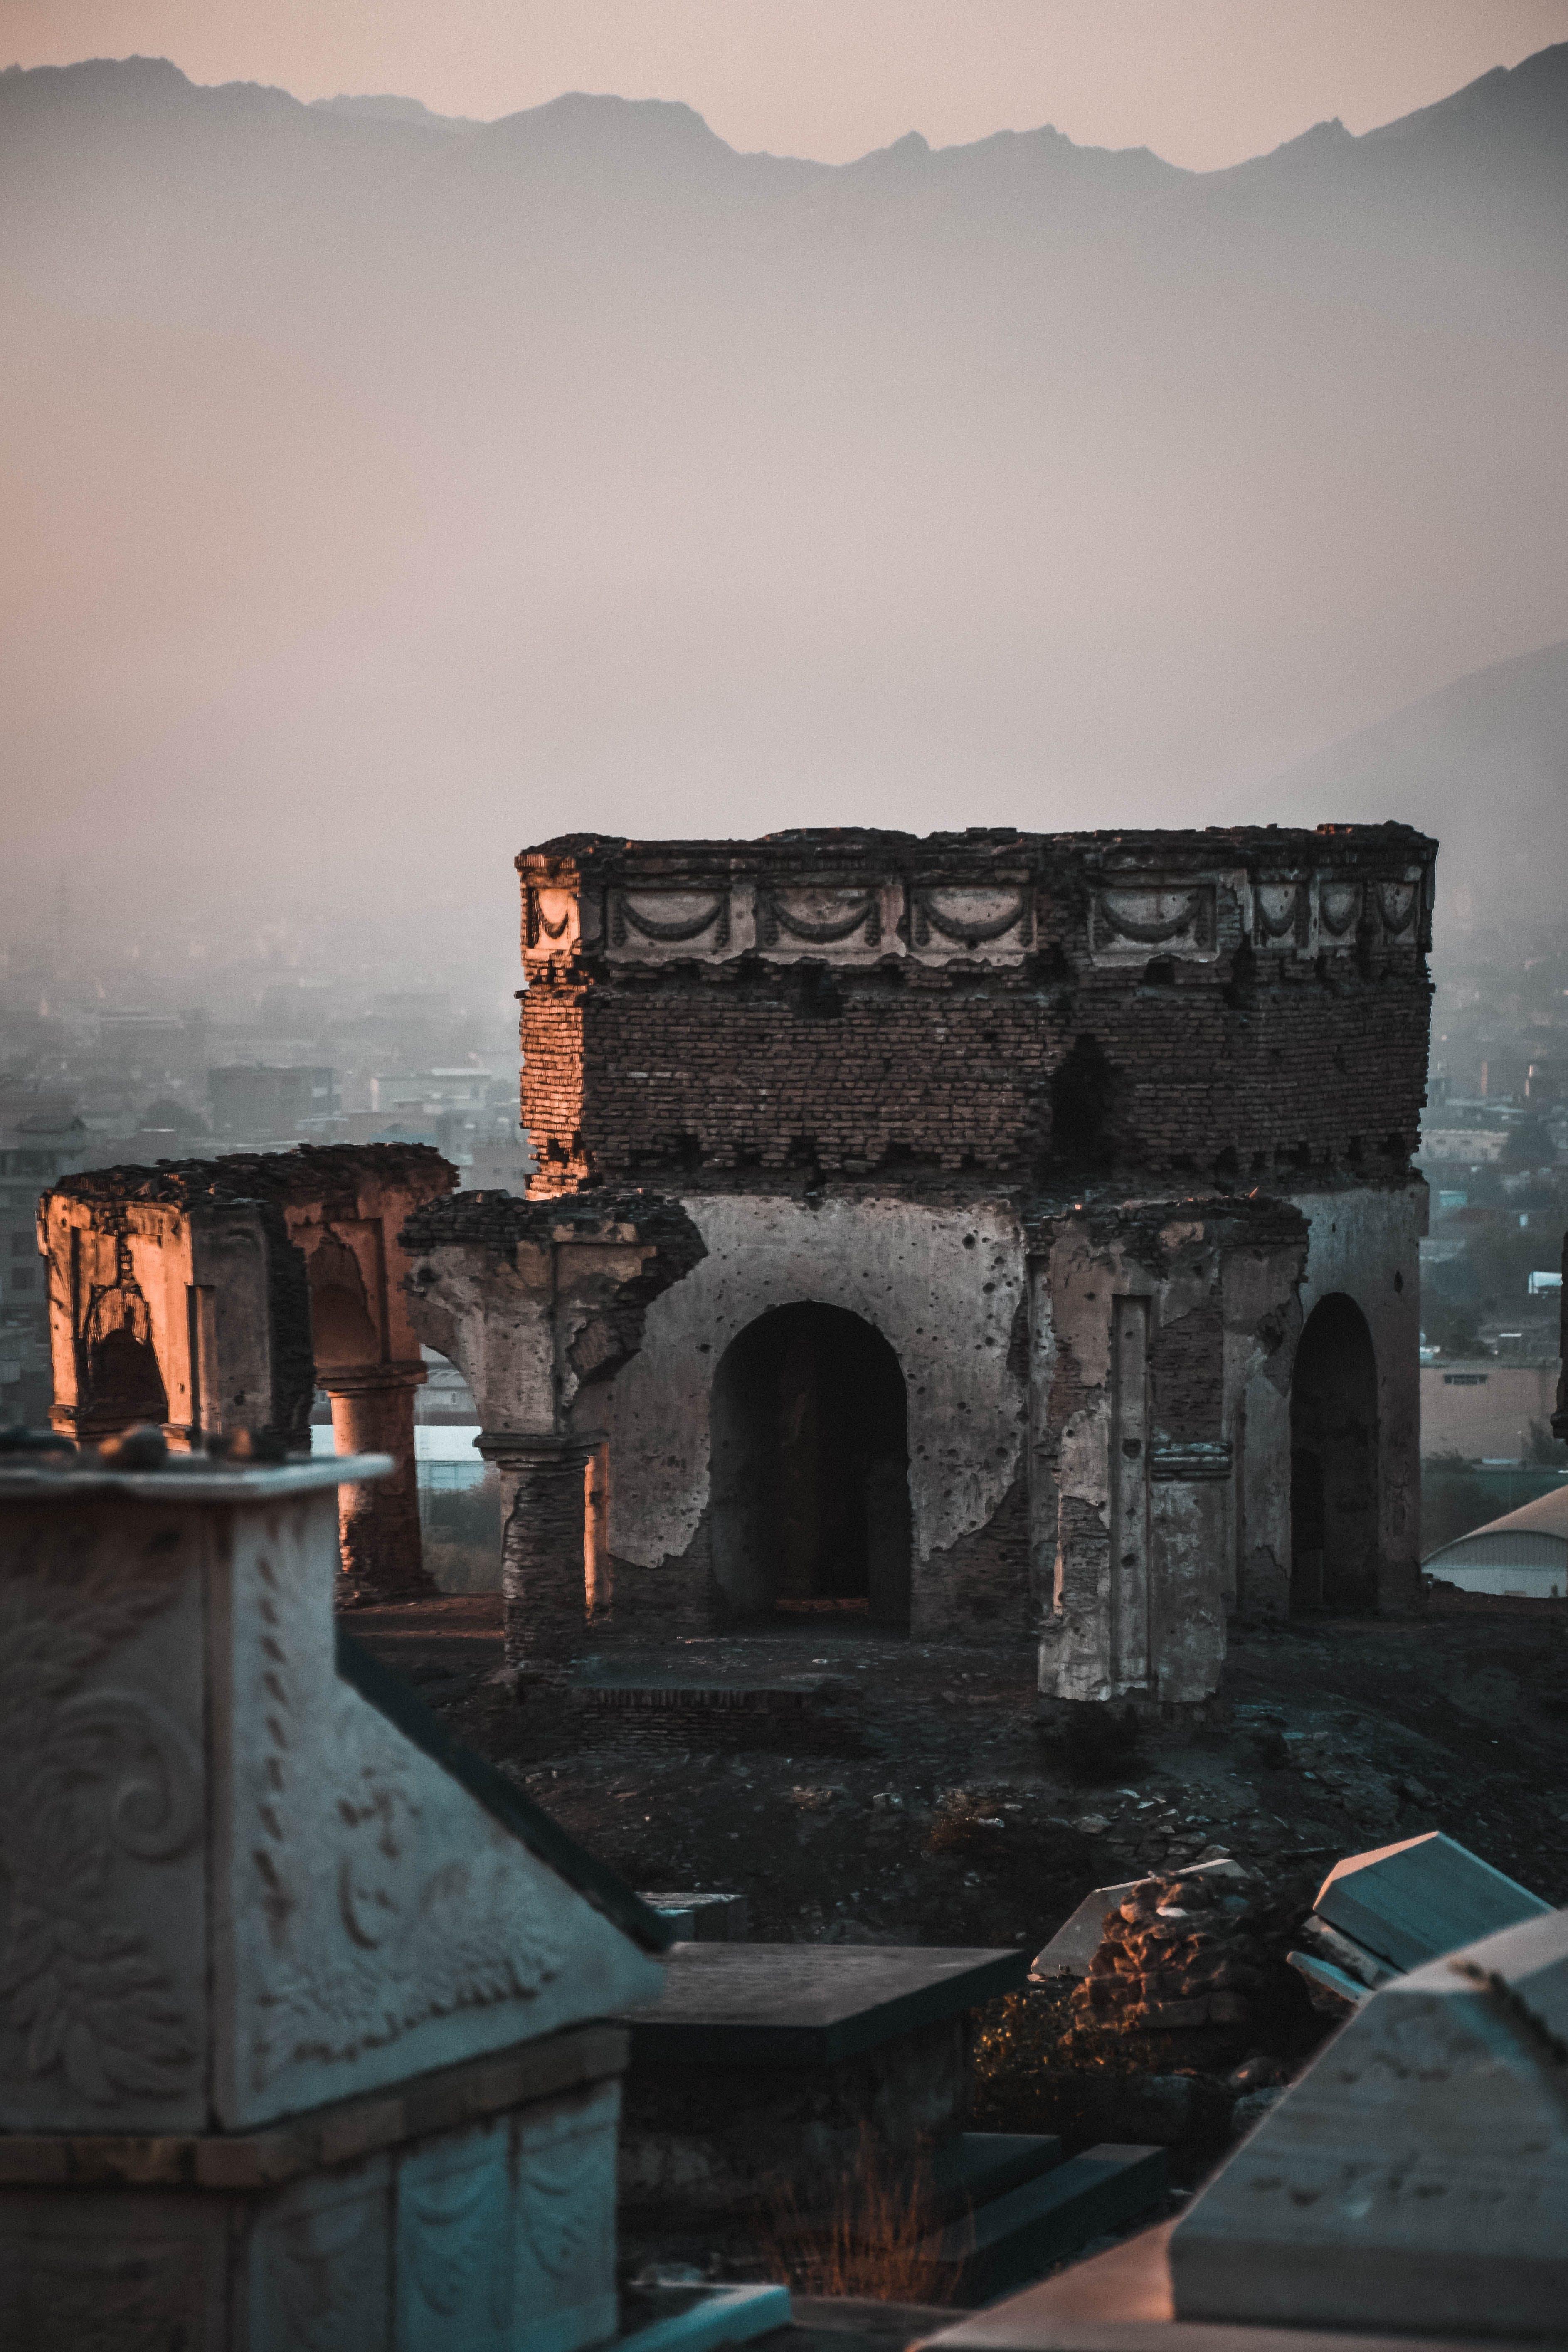 Concrete Ruins Near Mountain Range